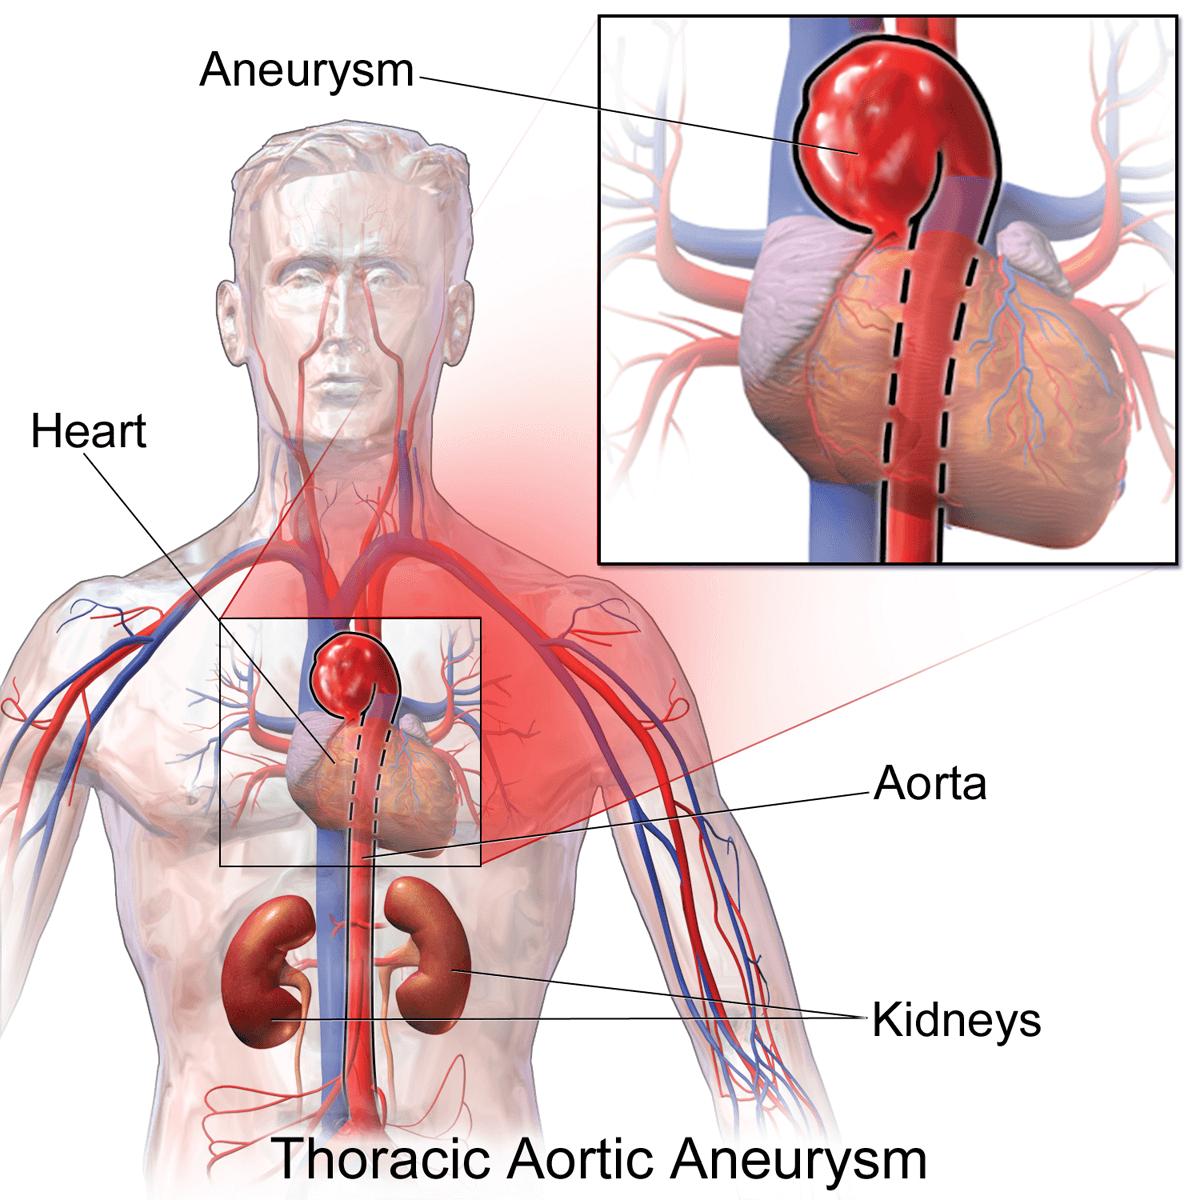 I71.1 Аневризма грудной части аорты разорванная